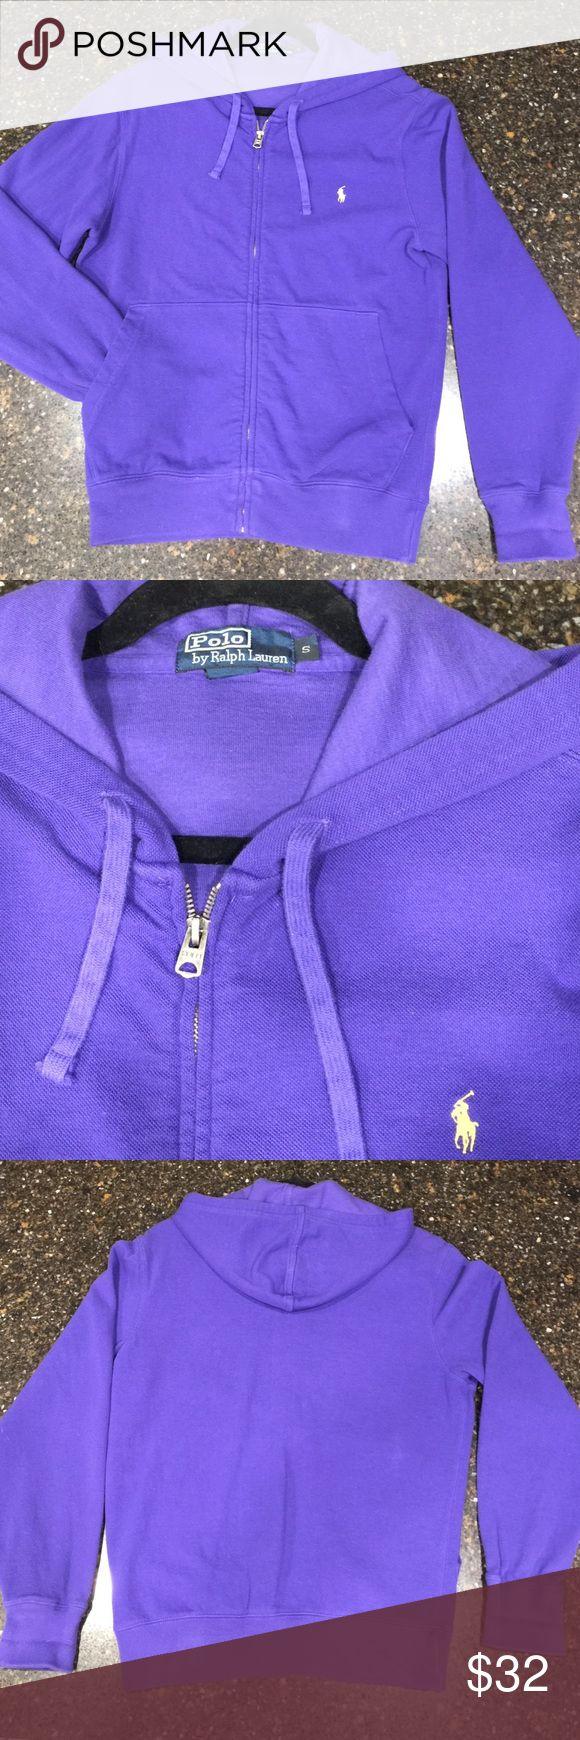 Polo by Ralph Lauren Purple zip up hoodie. Size S Super Cute Purple zip up hoodie, no stain or snags. Zipper works fine. Measurements: armpit to armpit 21, sleeve length 25.5, length 25. Polo by Ralph Lauren Tops Sweatshirts & Hoodies